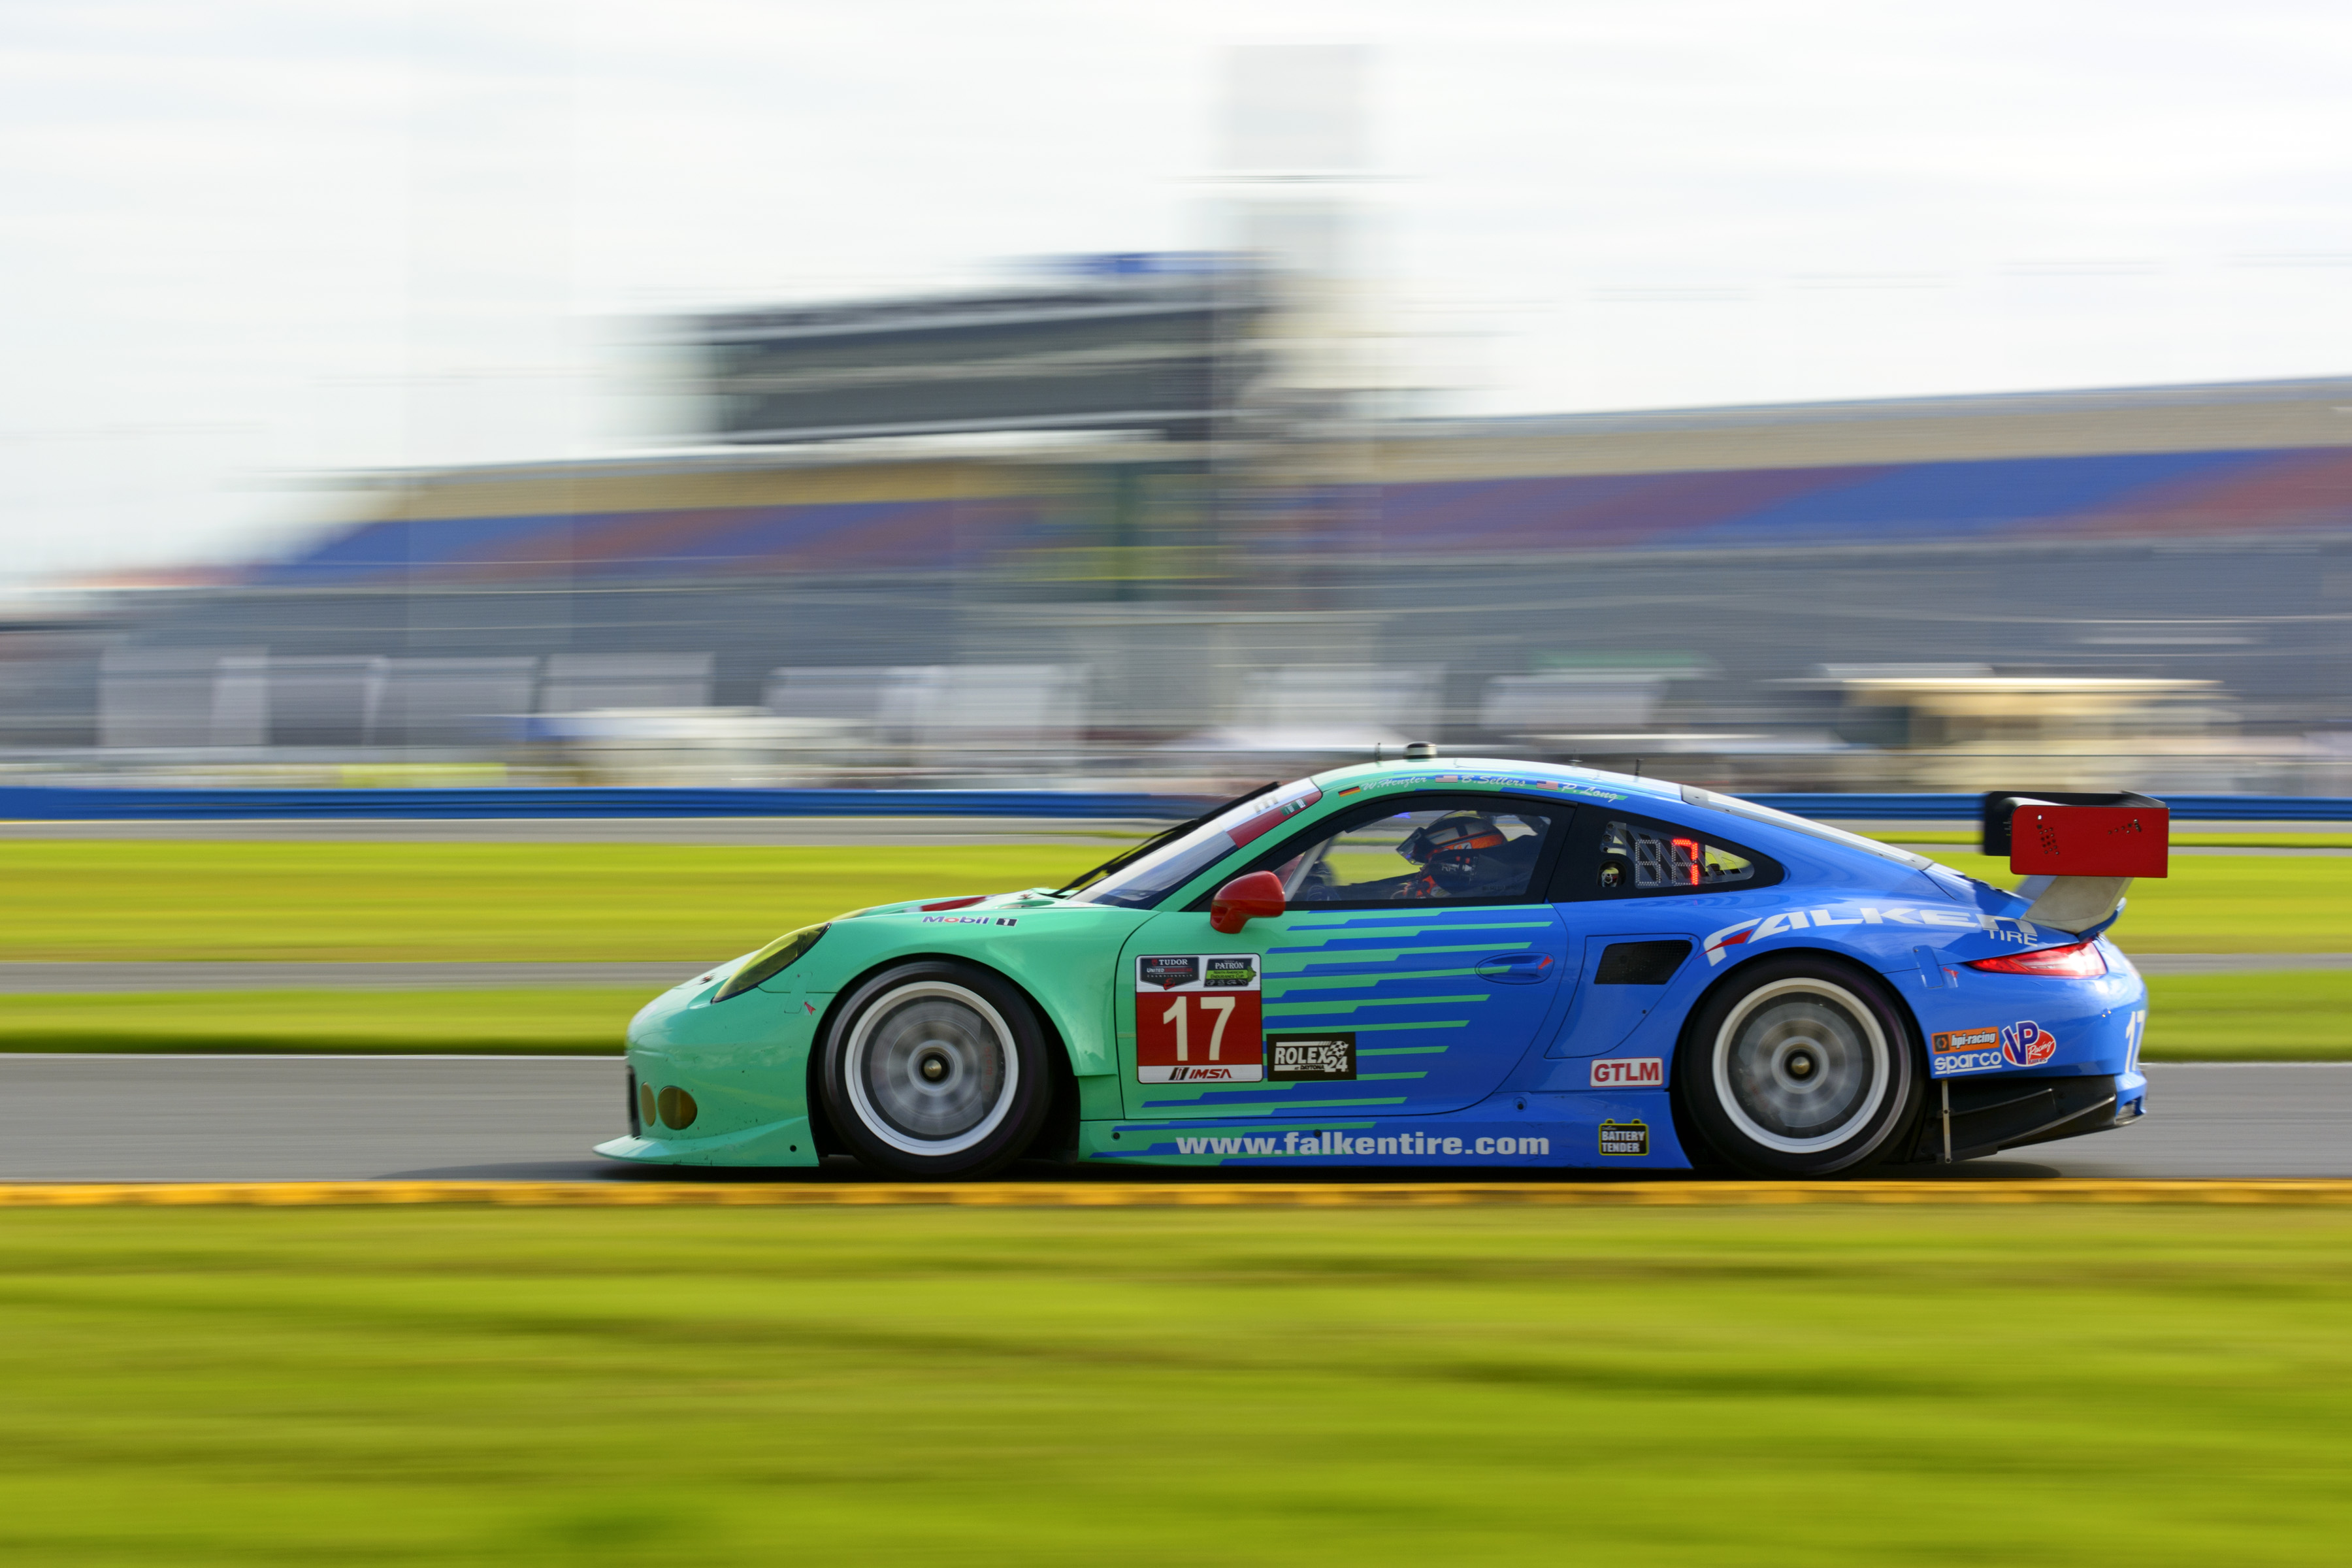 The iconic teal and blue Falken Tire Porsche 911 RSR at Daytona raceway.